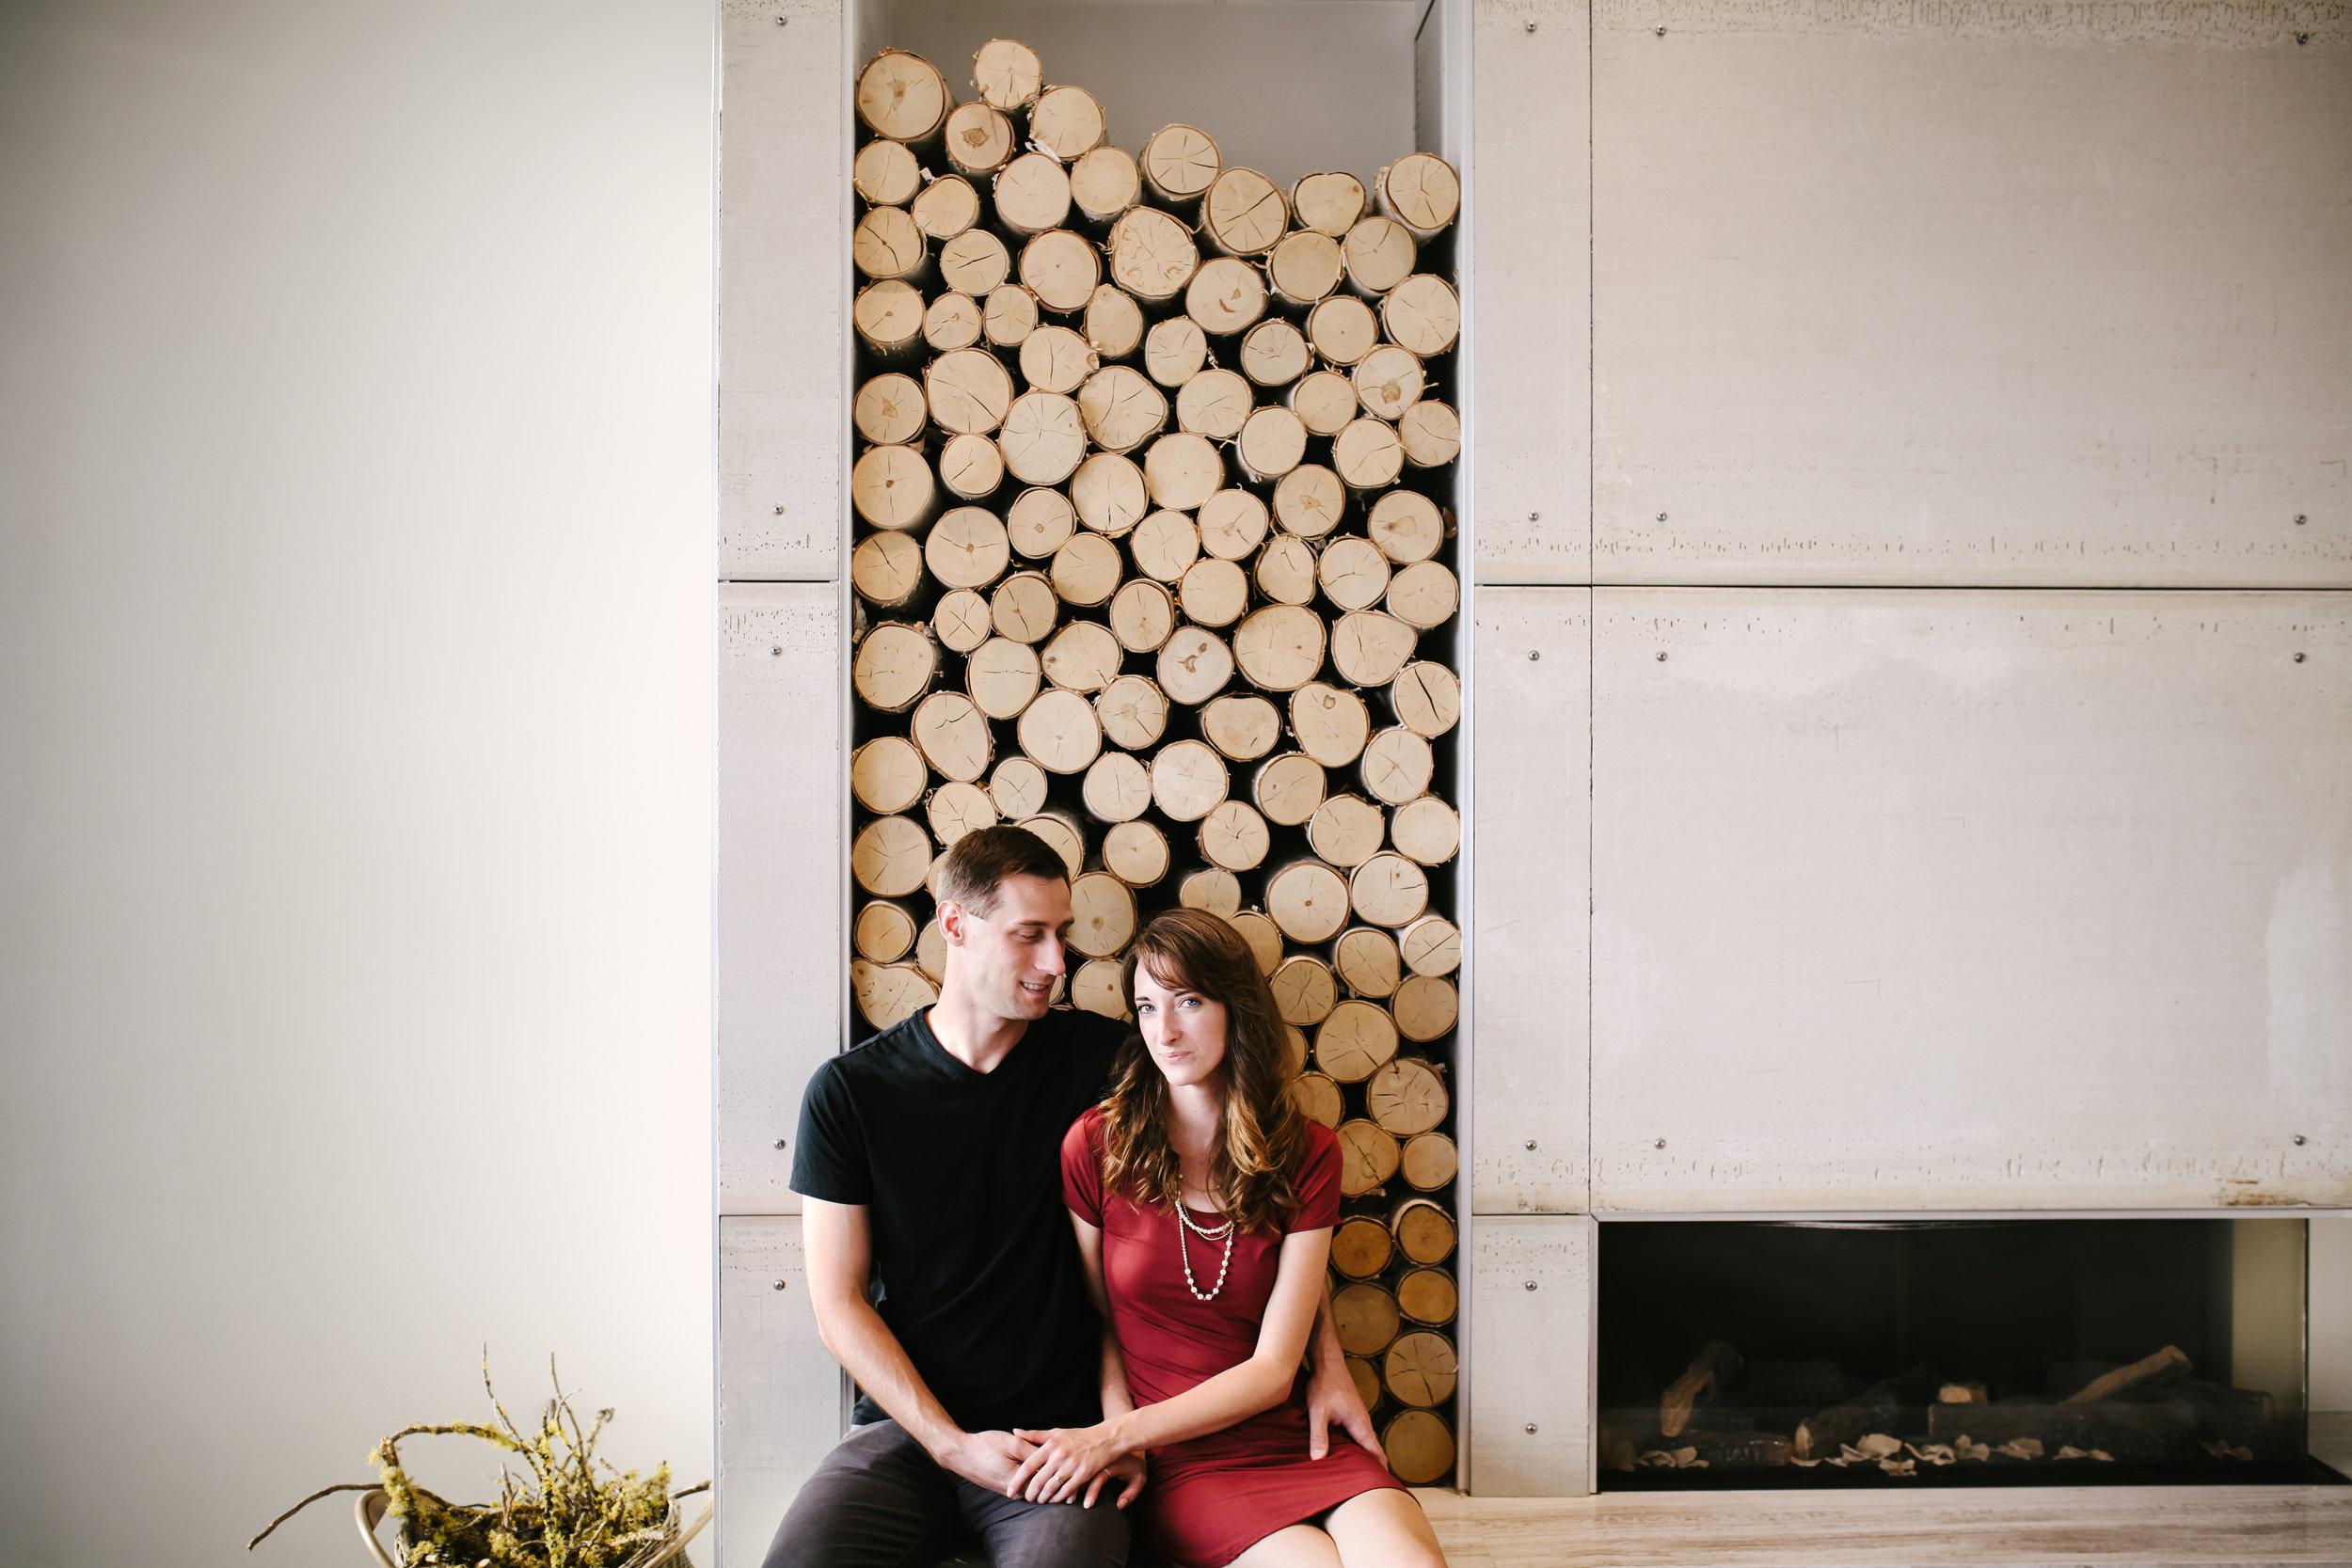 Katy and Dustin-7.jpg